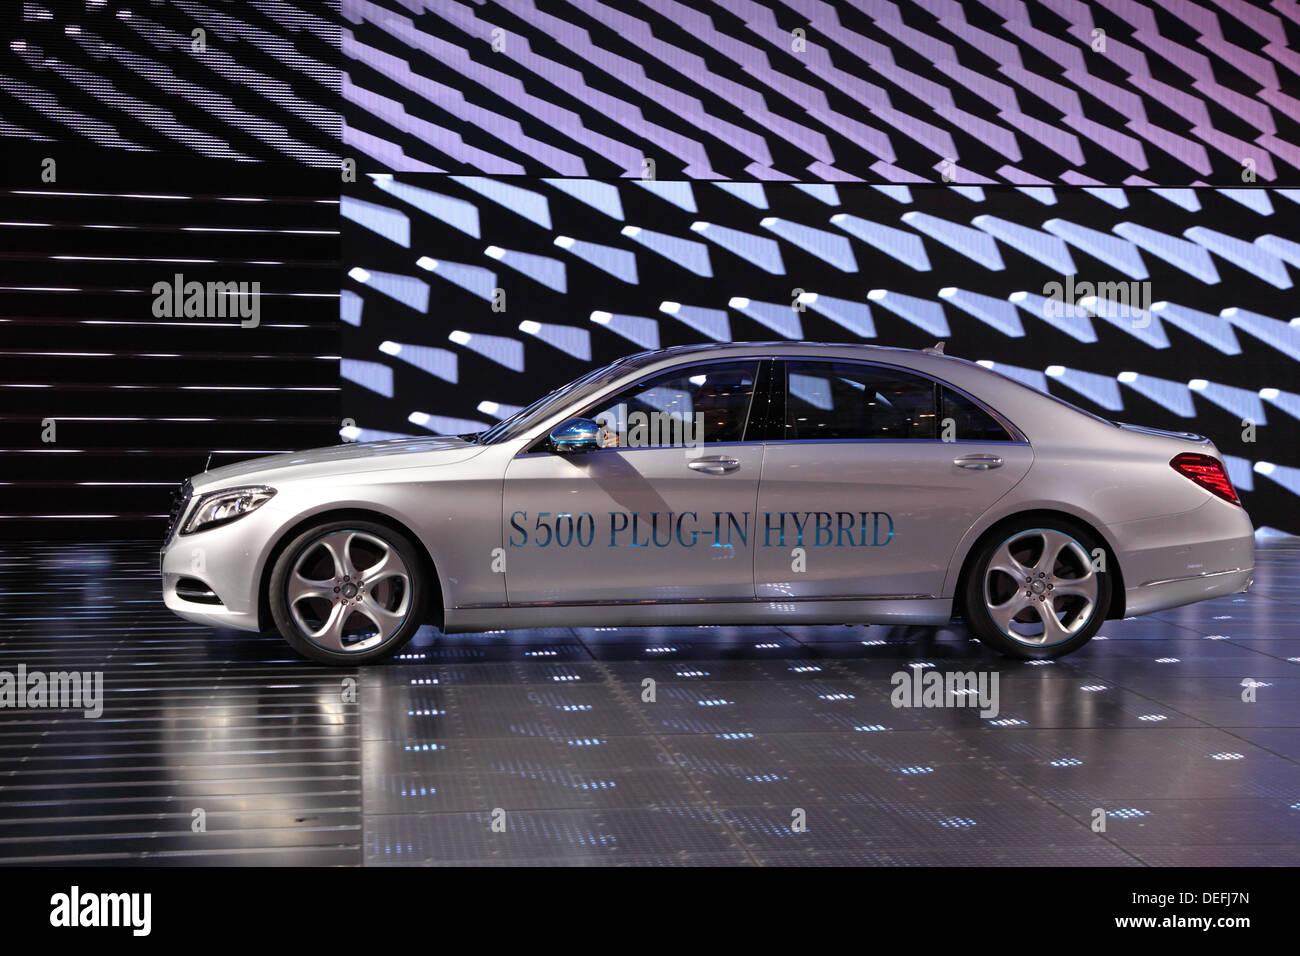 Frankfurt, Germany. 17th Sep, 2013. International Motor Show in Frankfurt, Germany. Mercedes Benz S500 Plug-in Hybrid - Stock Image